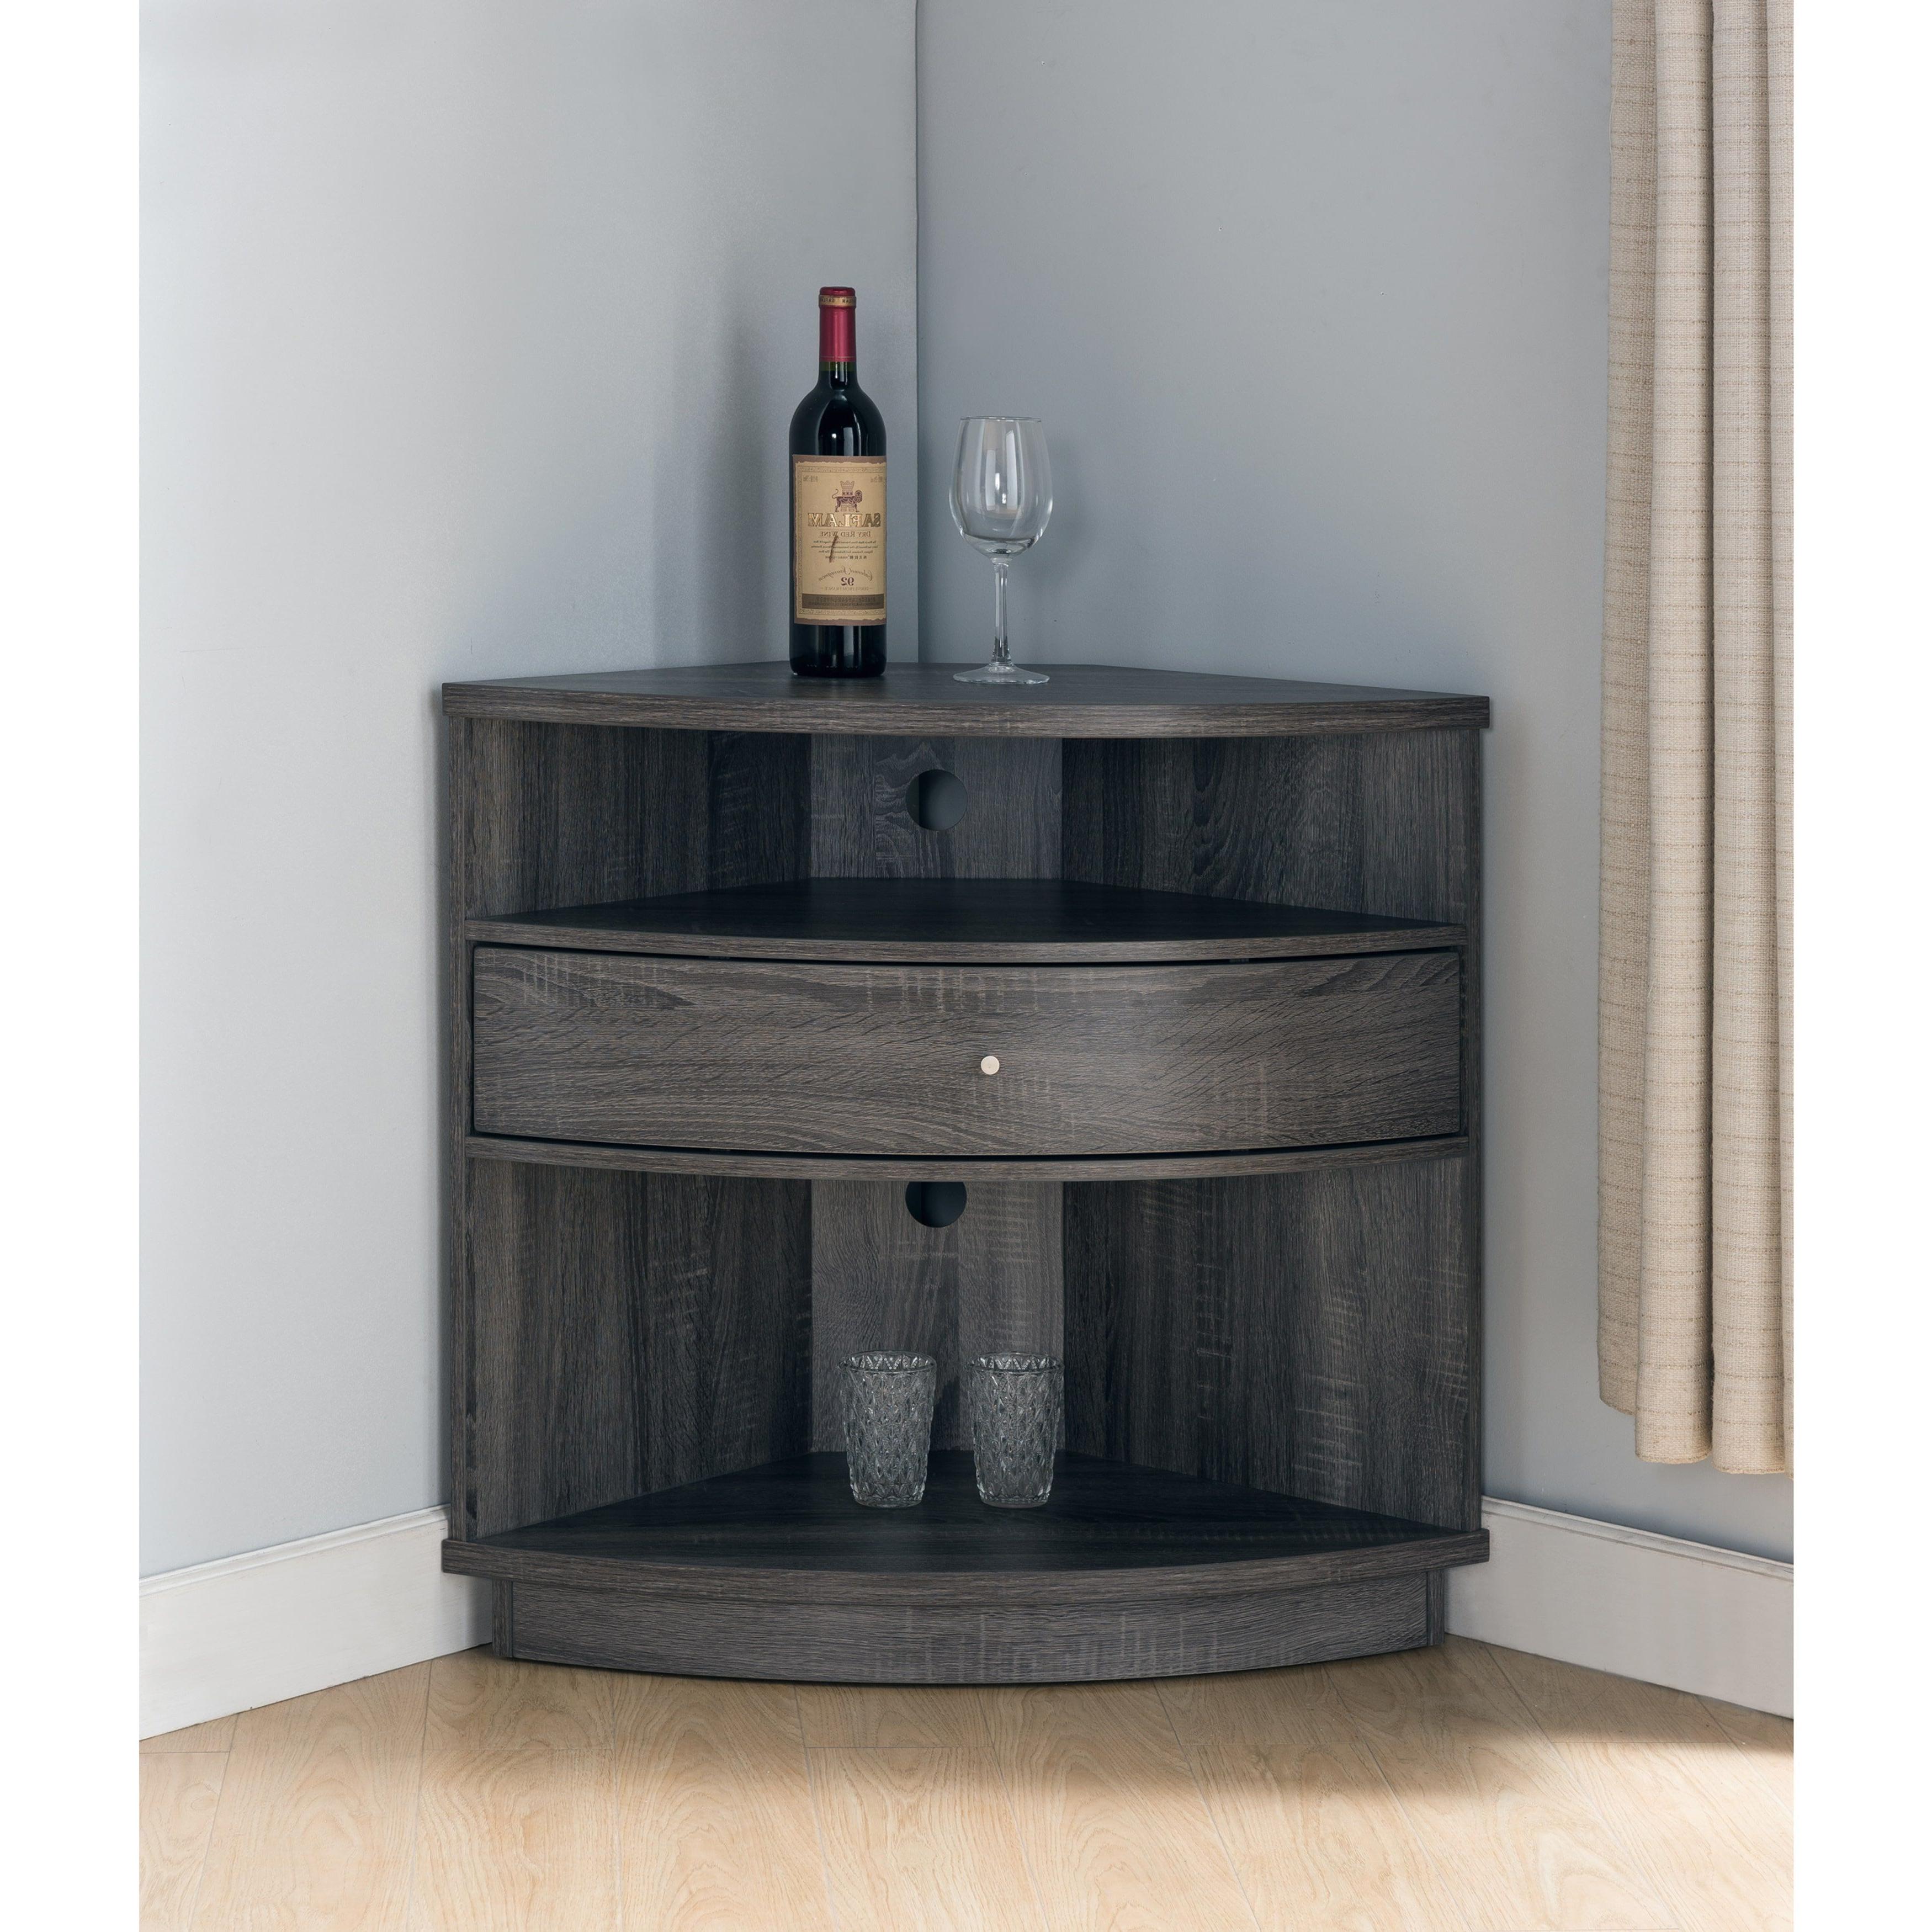 Furniture Of America Aishe Contemporary Multi Shelf Corner Inside Multi Shelf Corner Buffets (View 2 of 20)